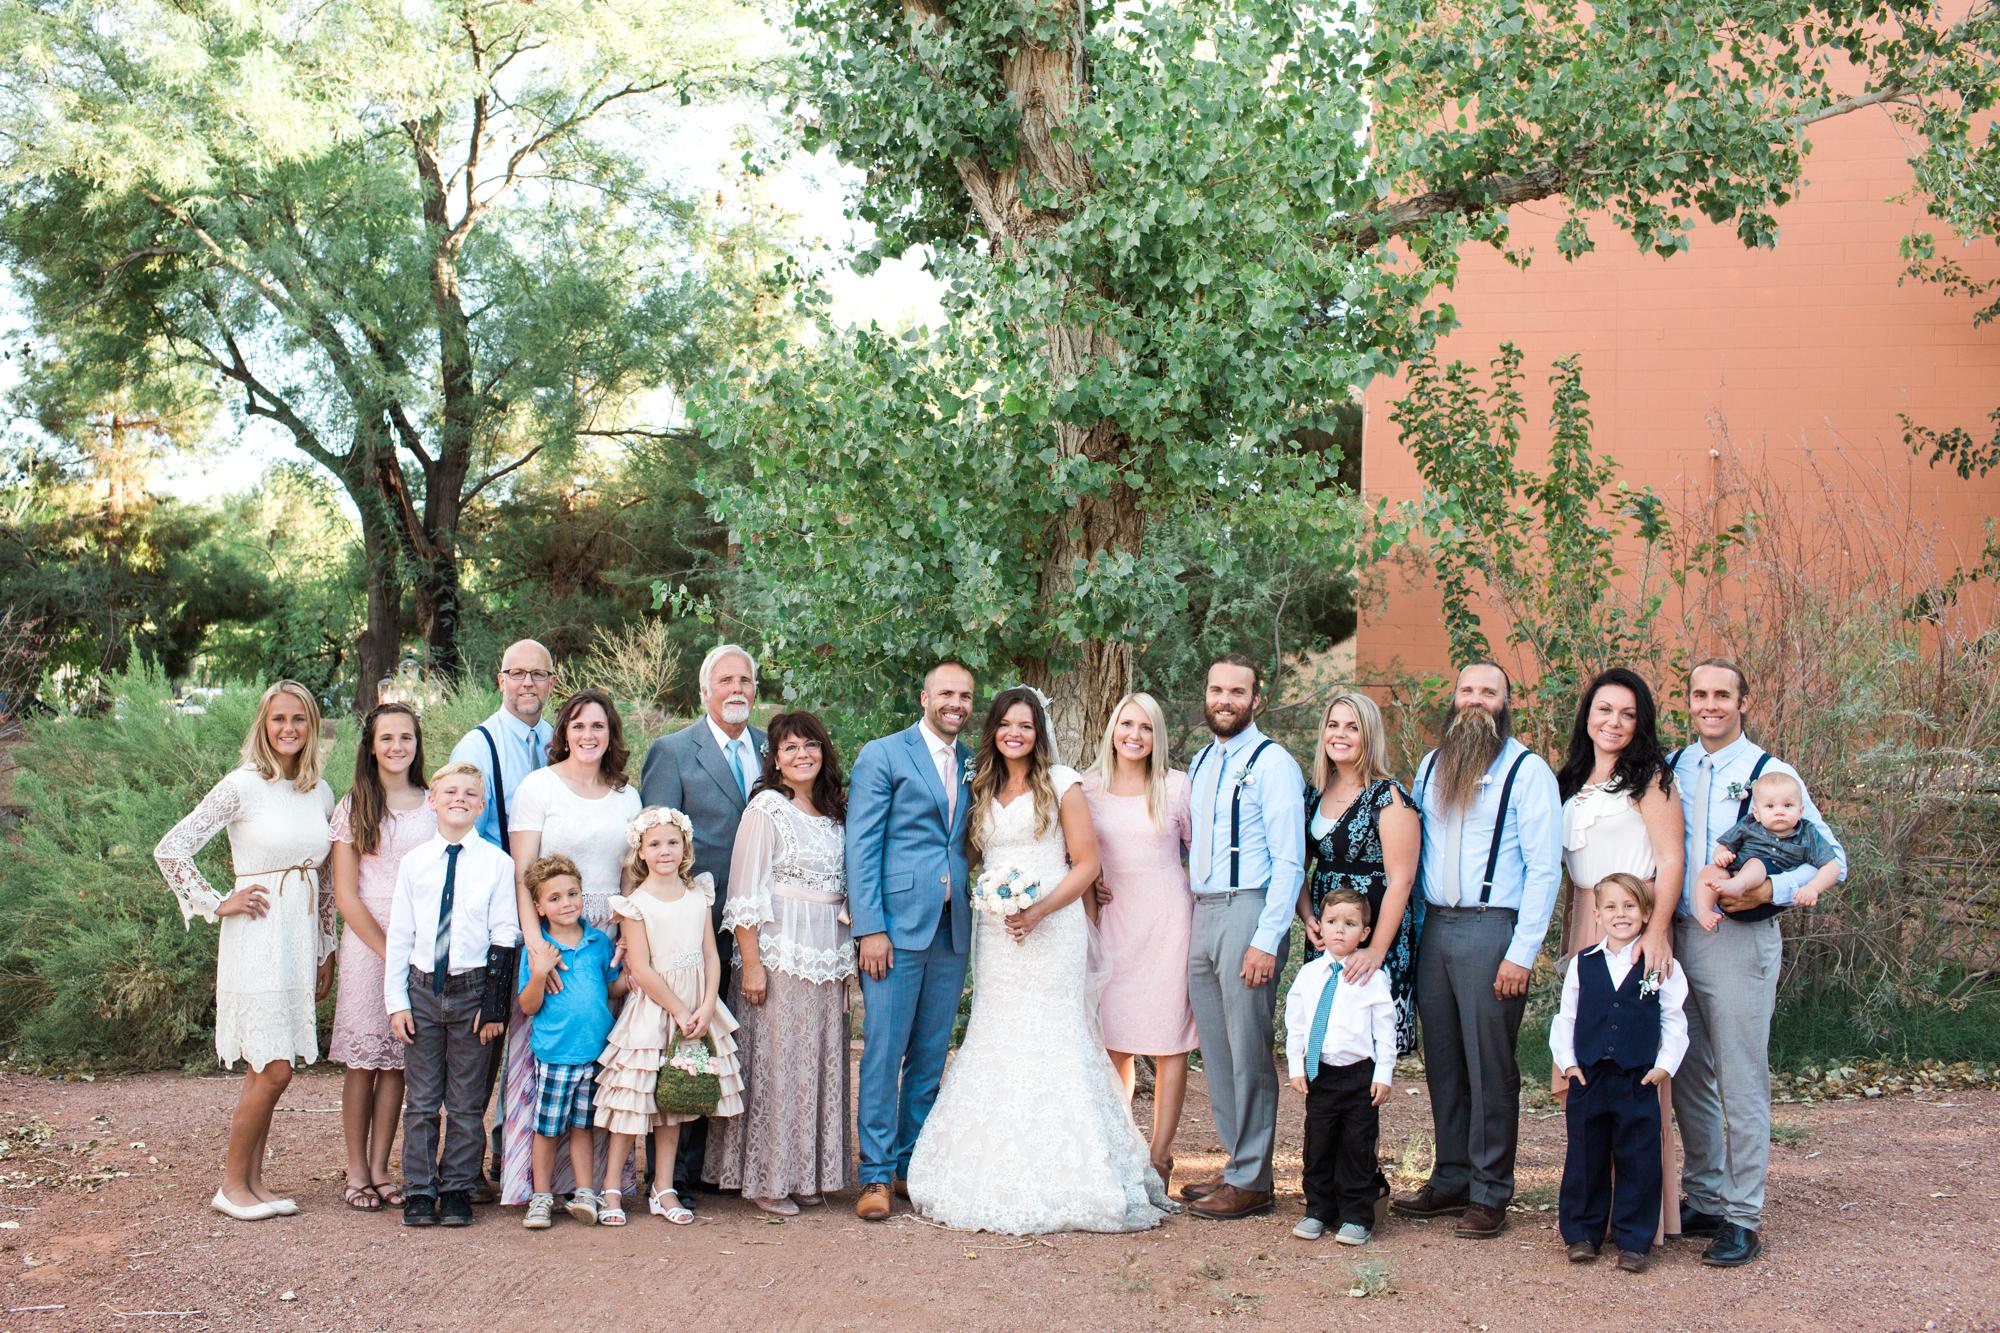 Trish-Jake-Wedding-245.jpg